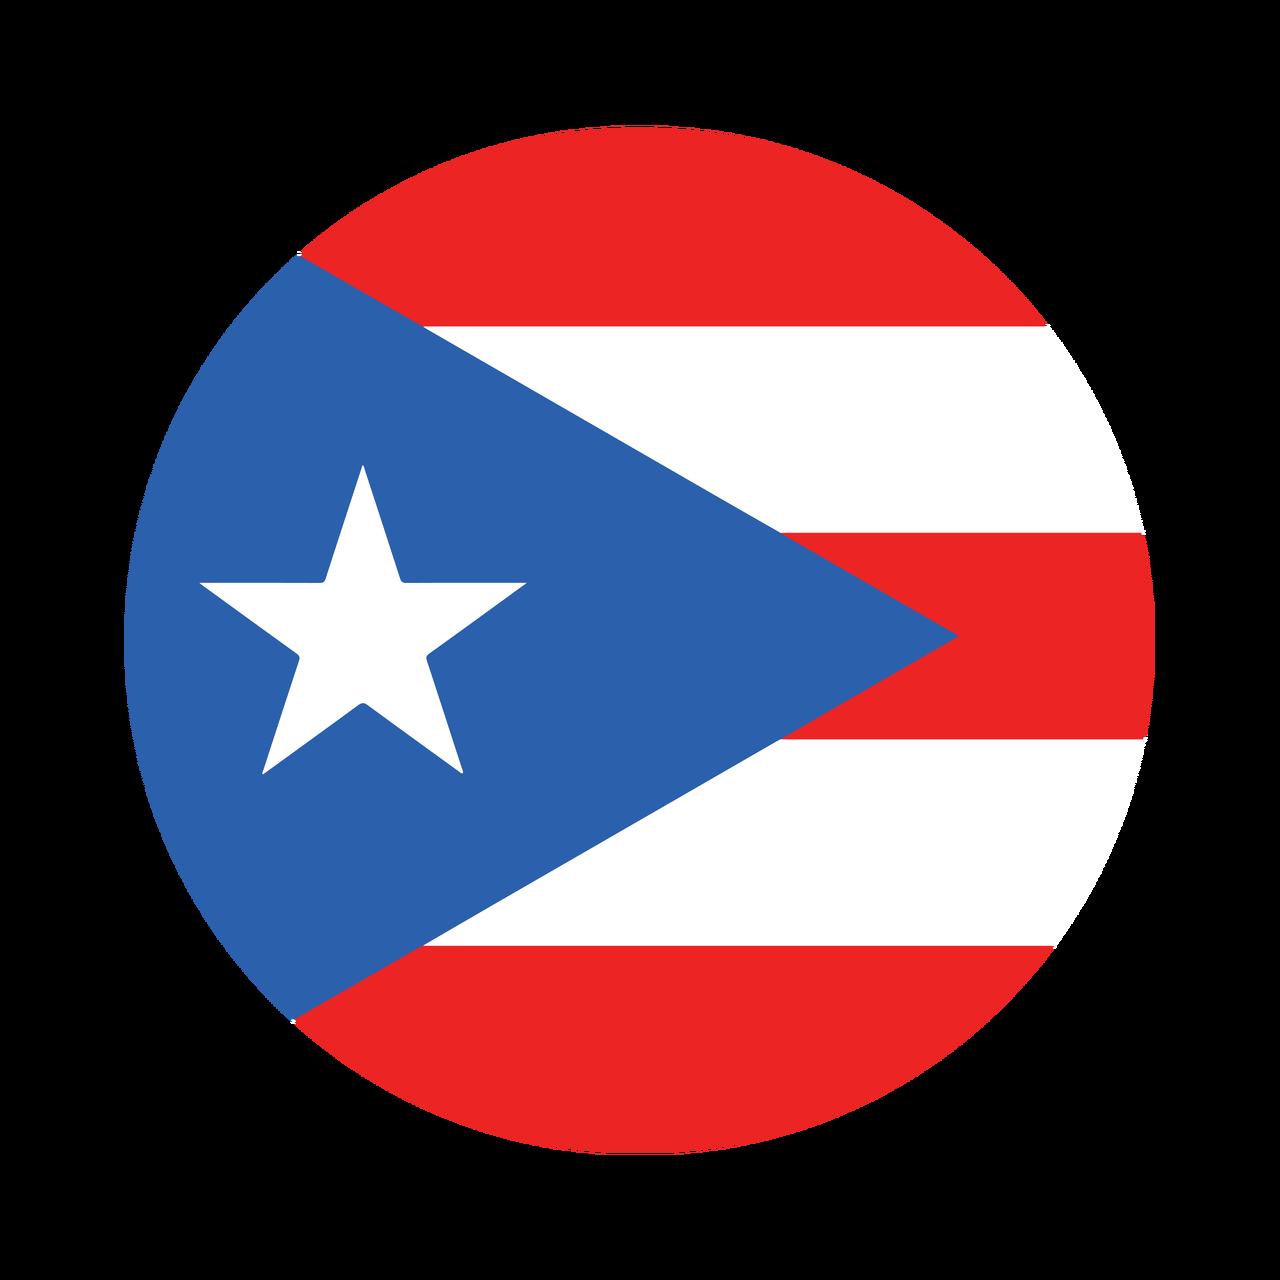 Puerto rico flag knob sticker victus sports